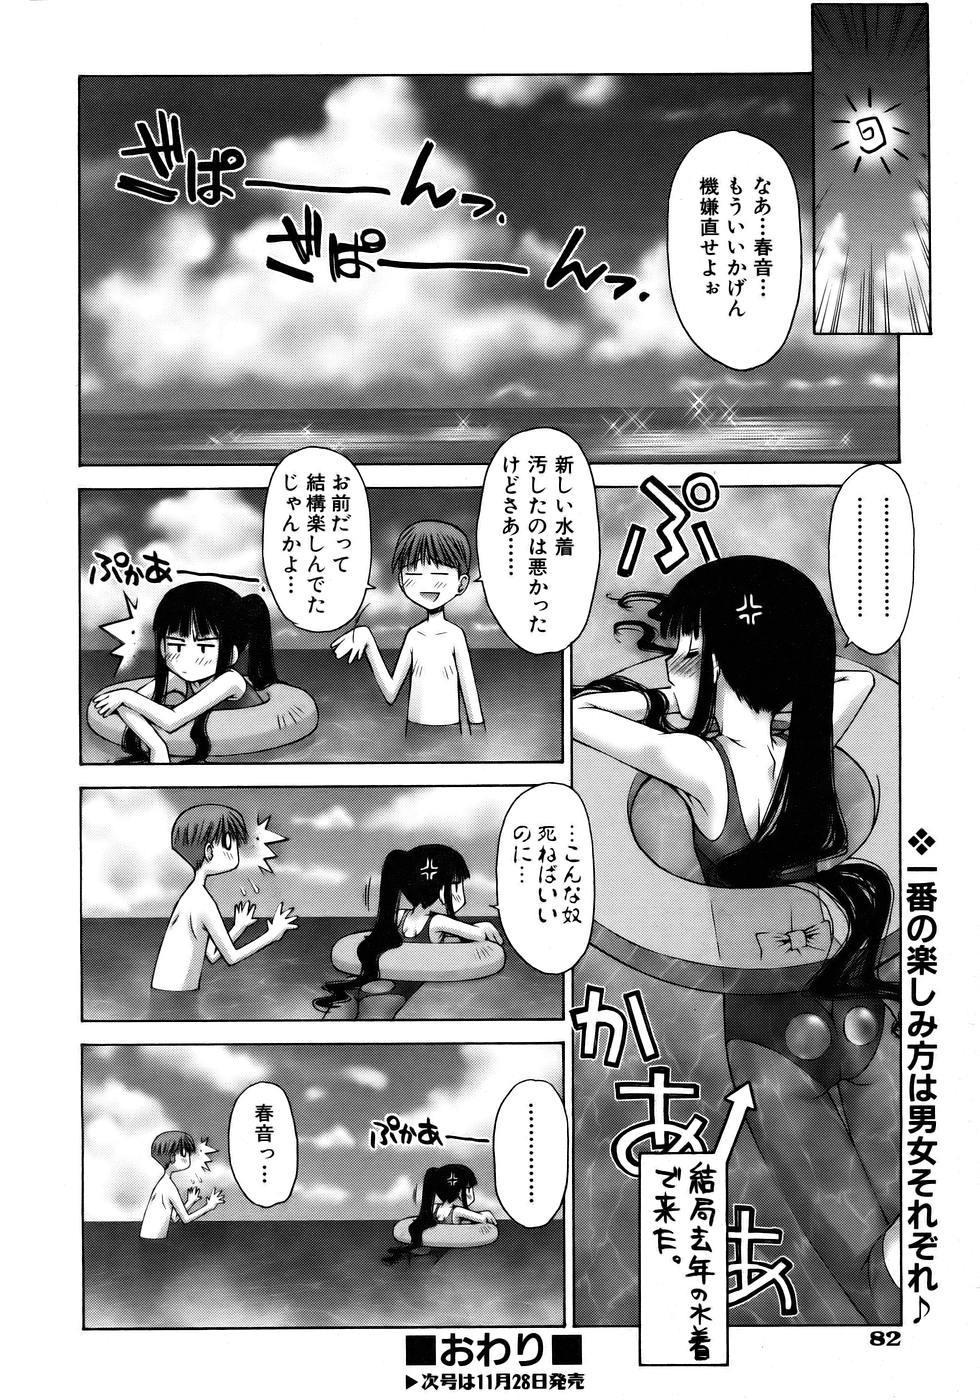 COMIC AUN 2005-12 Vol. 115 81